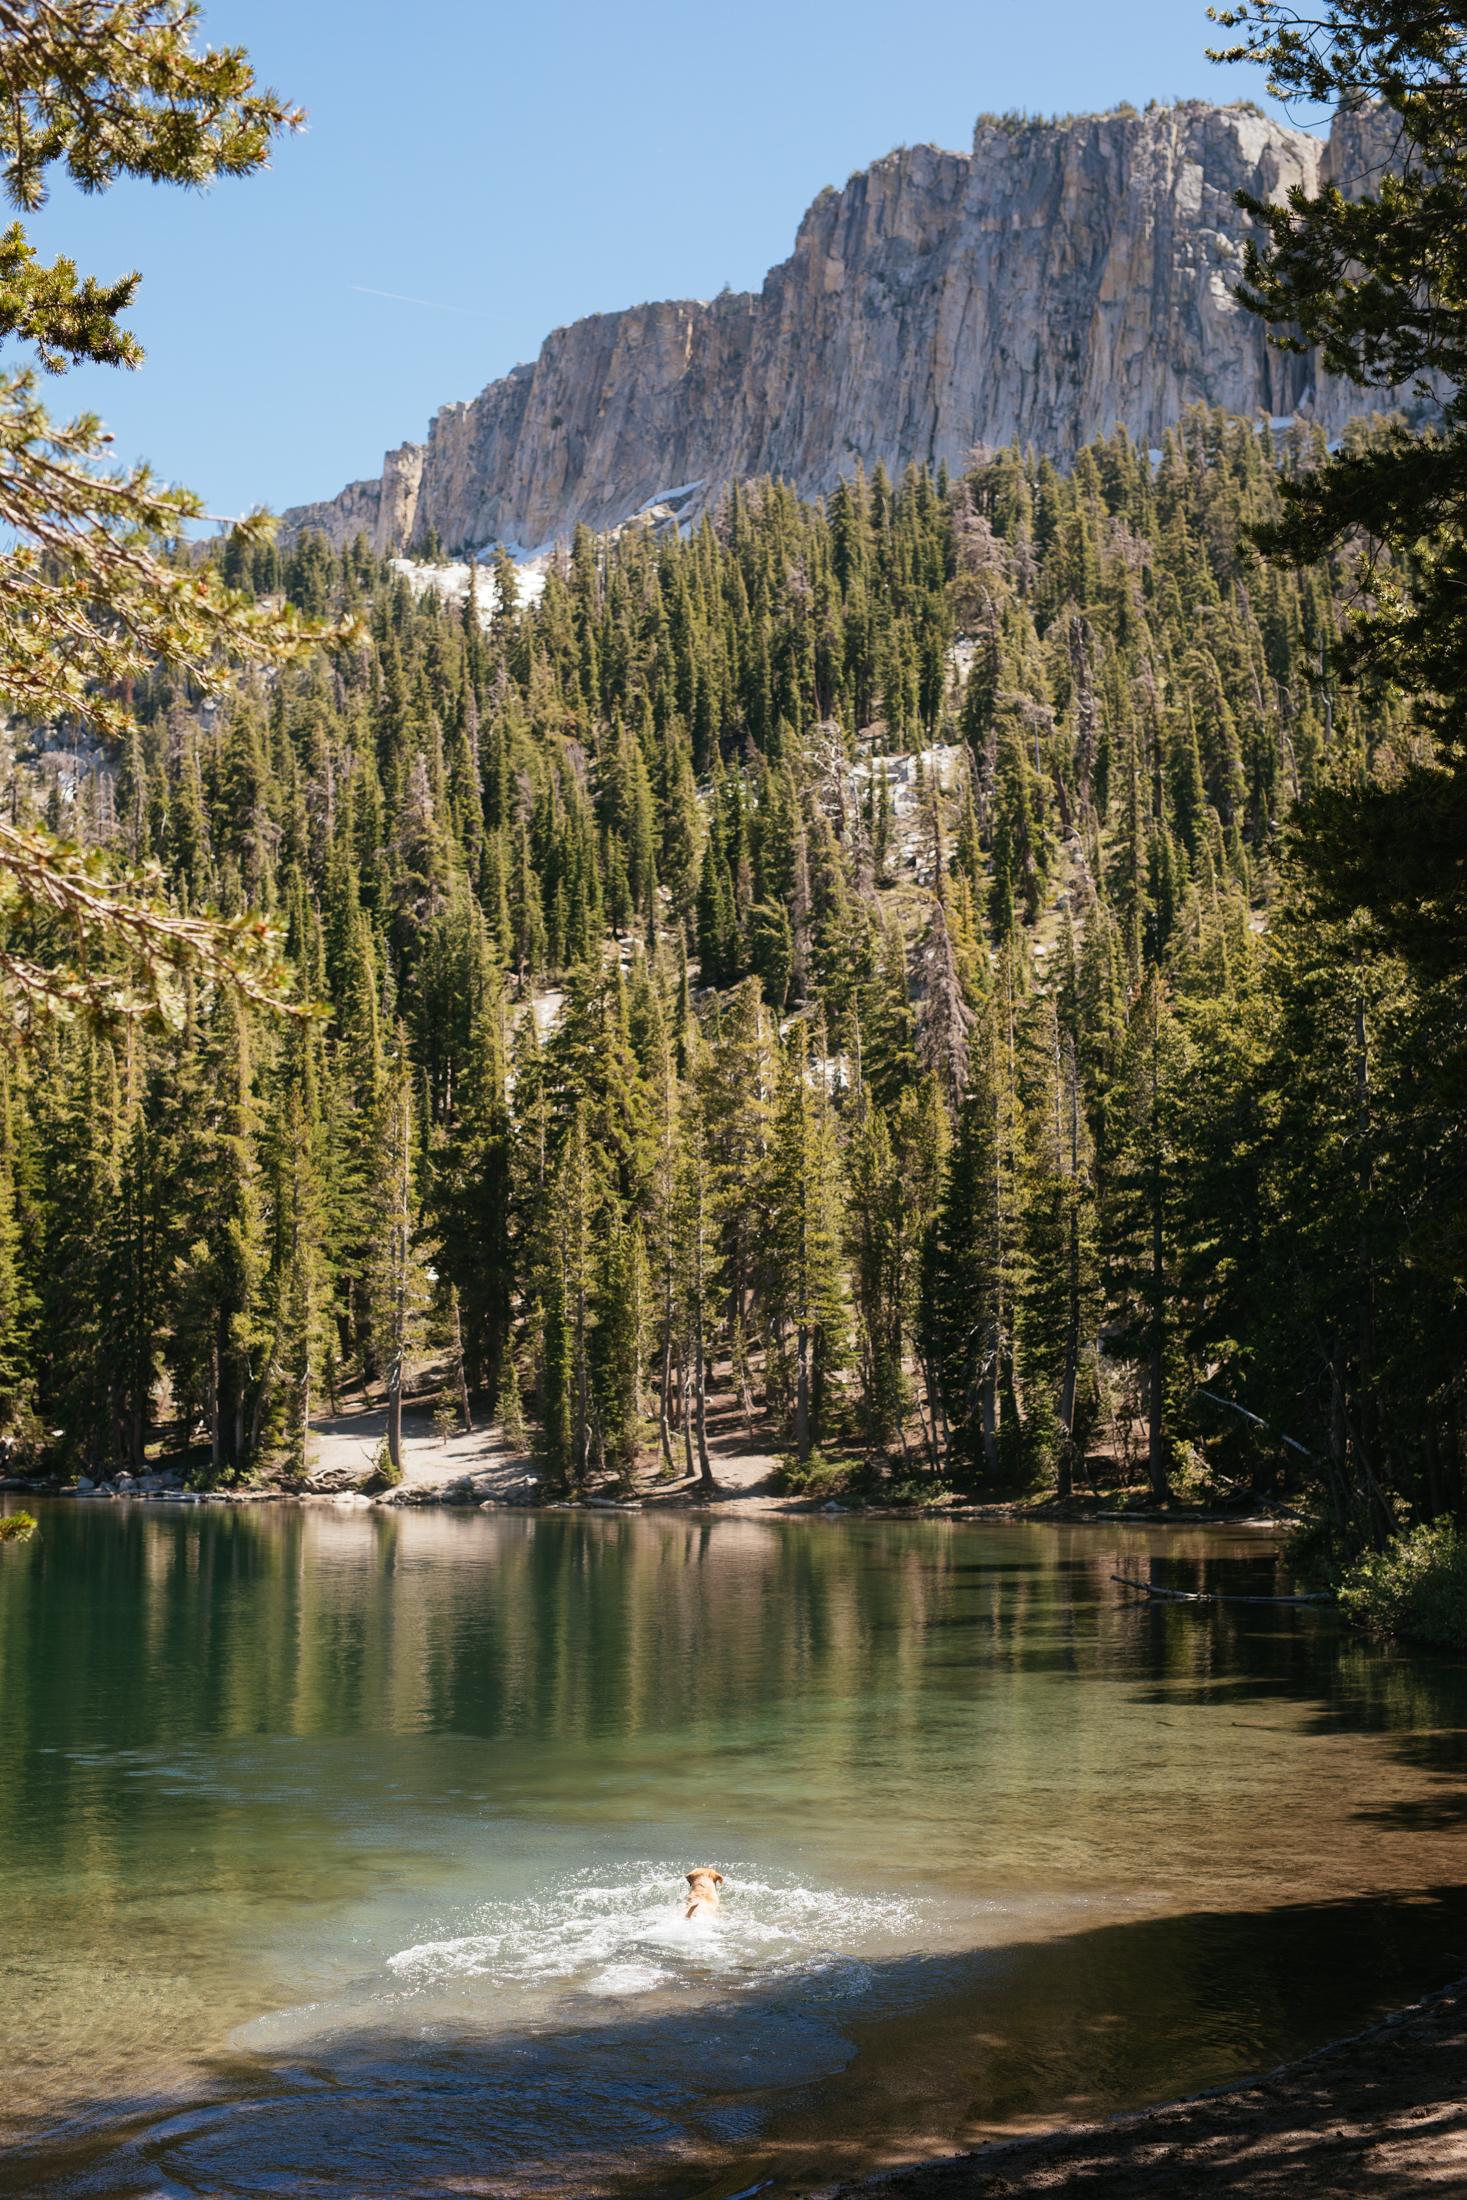 Day 12 - Mammoth Lakes, California